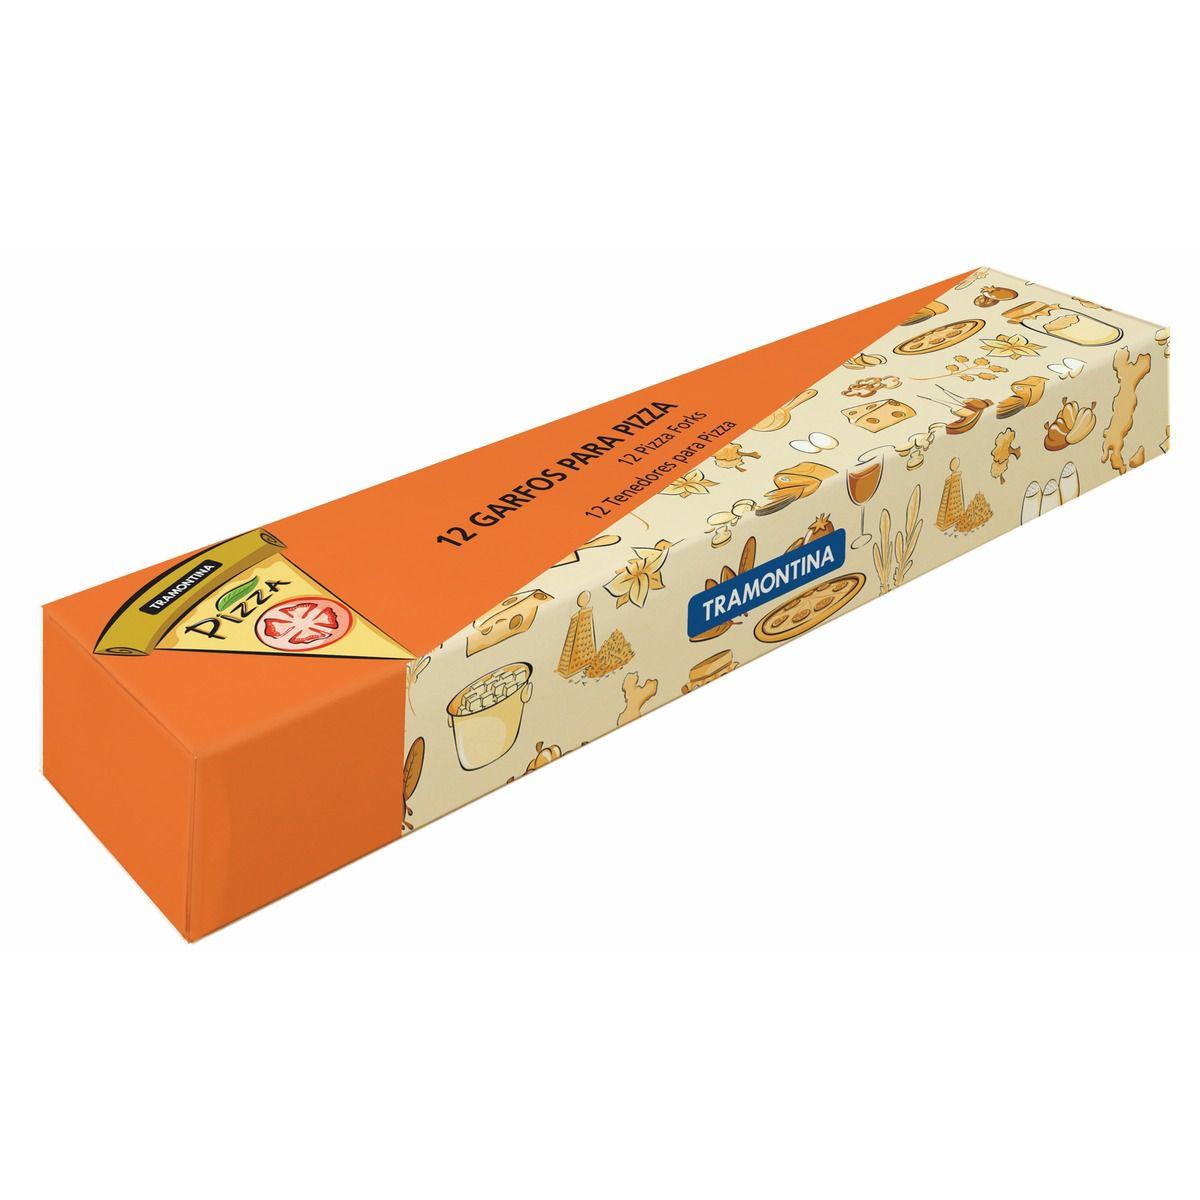 Garfos para pizza aço inox 63950/840 | Lojas Estrela